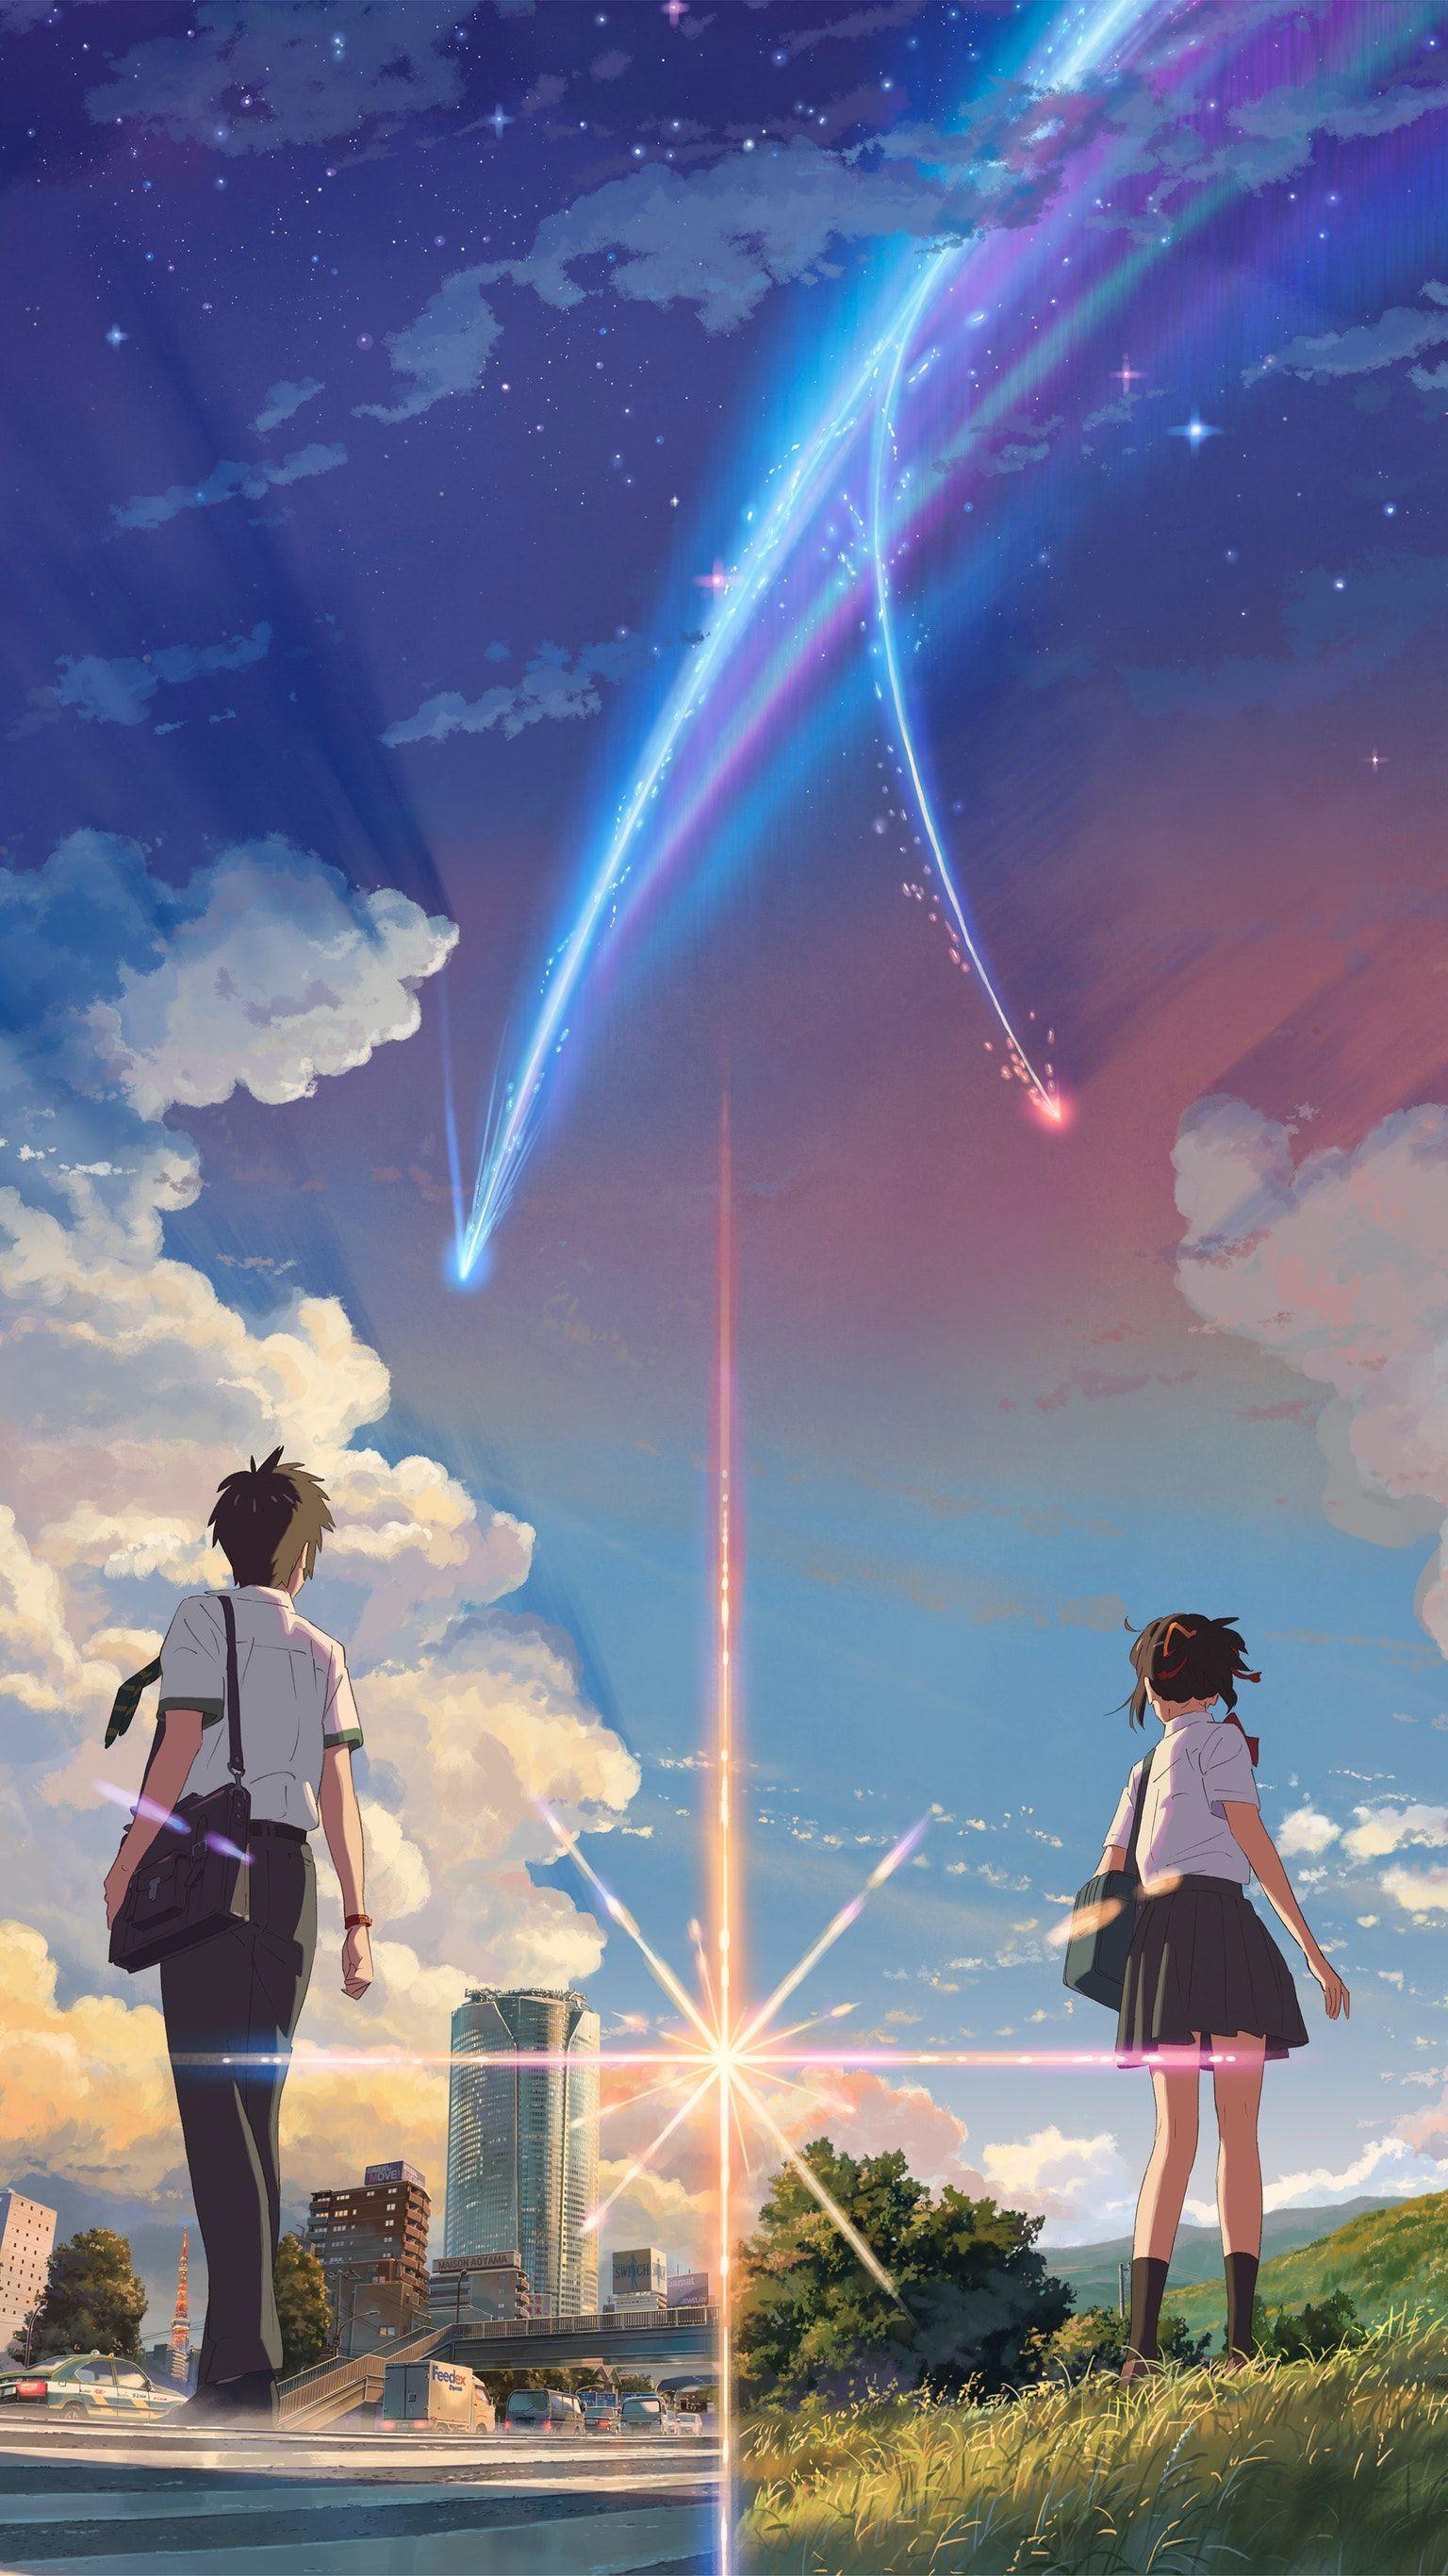 Your Name. (2016) Phone Wallpaper Anime, Filmes de anime